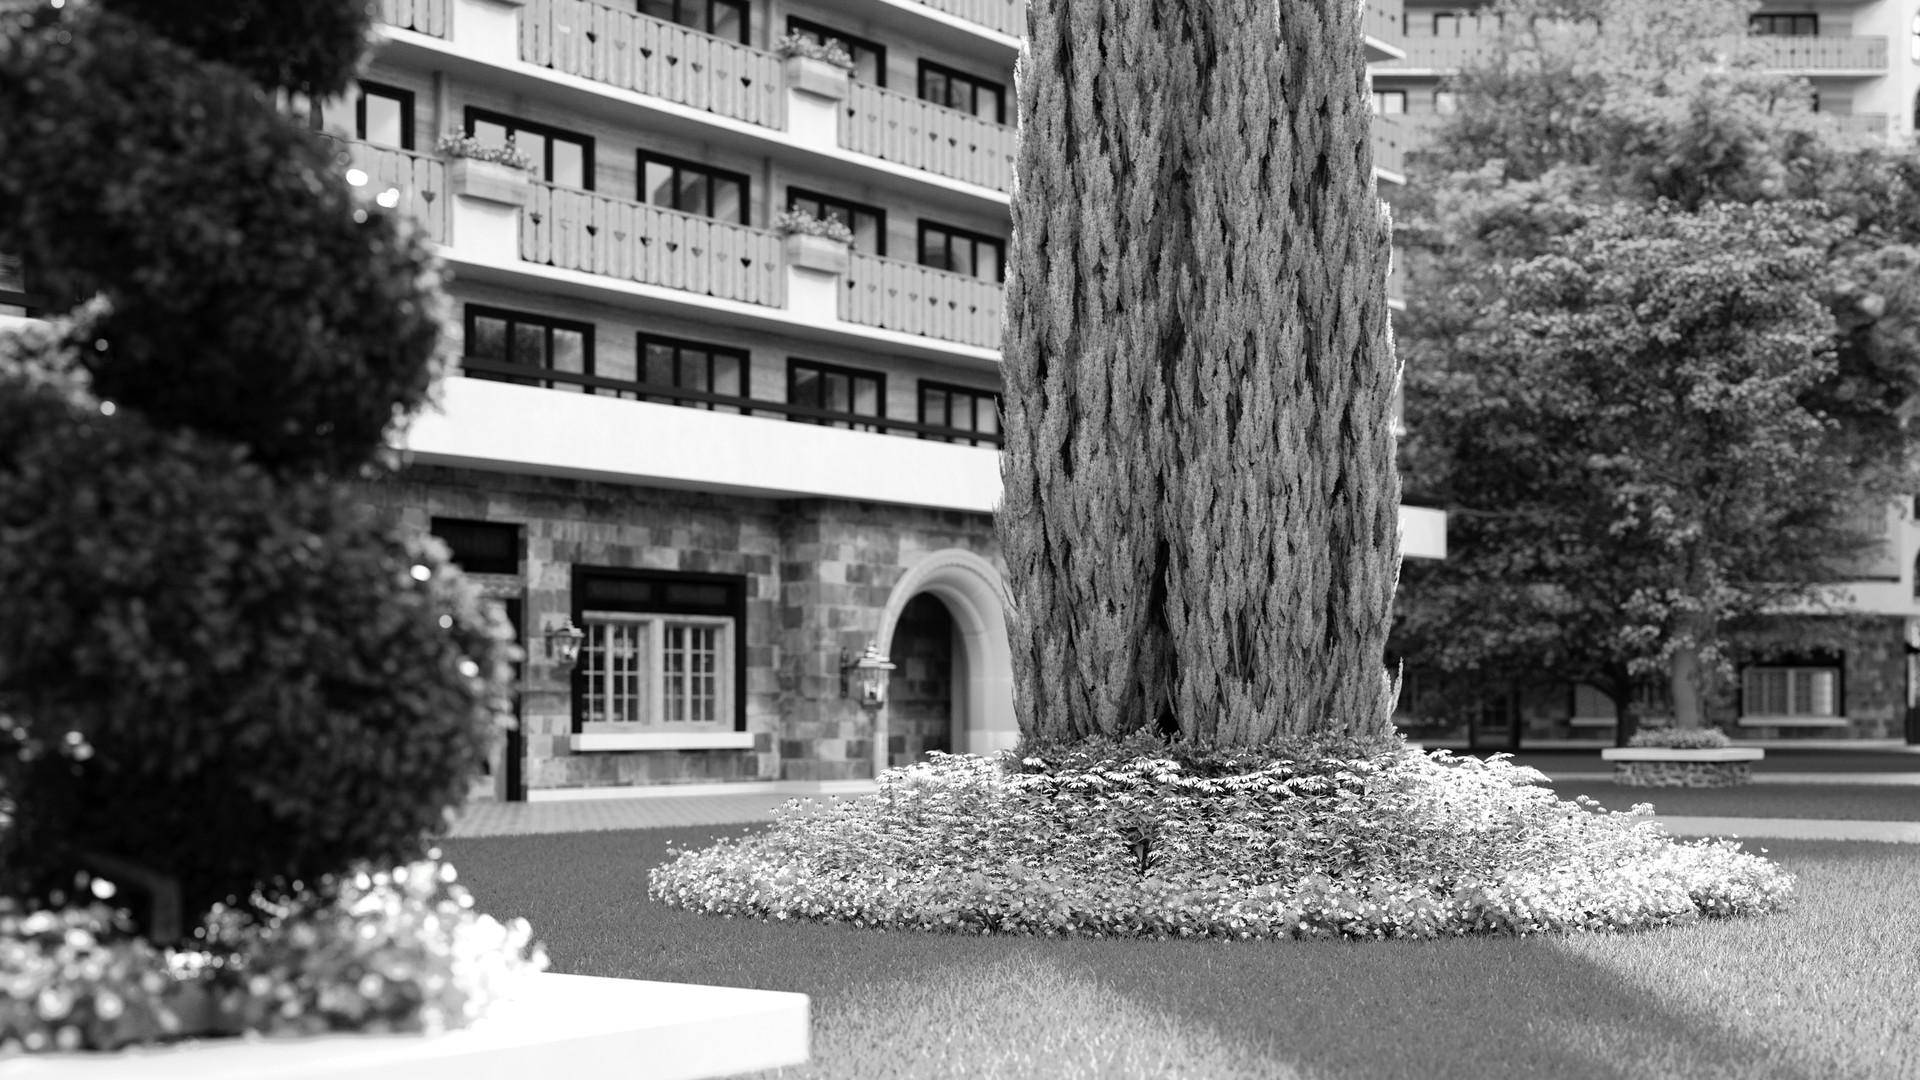 Duane kemp 03 eco cycle alpine hotel v2018 scene 91 pmc 1024 s px 2840x2160 4h15 hdr241 fp2900zg crf b bw